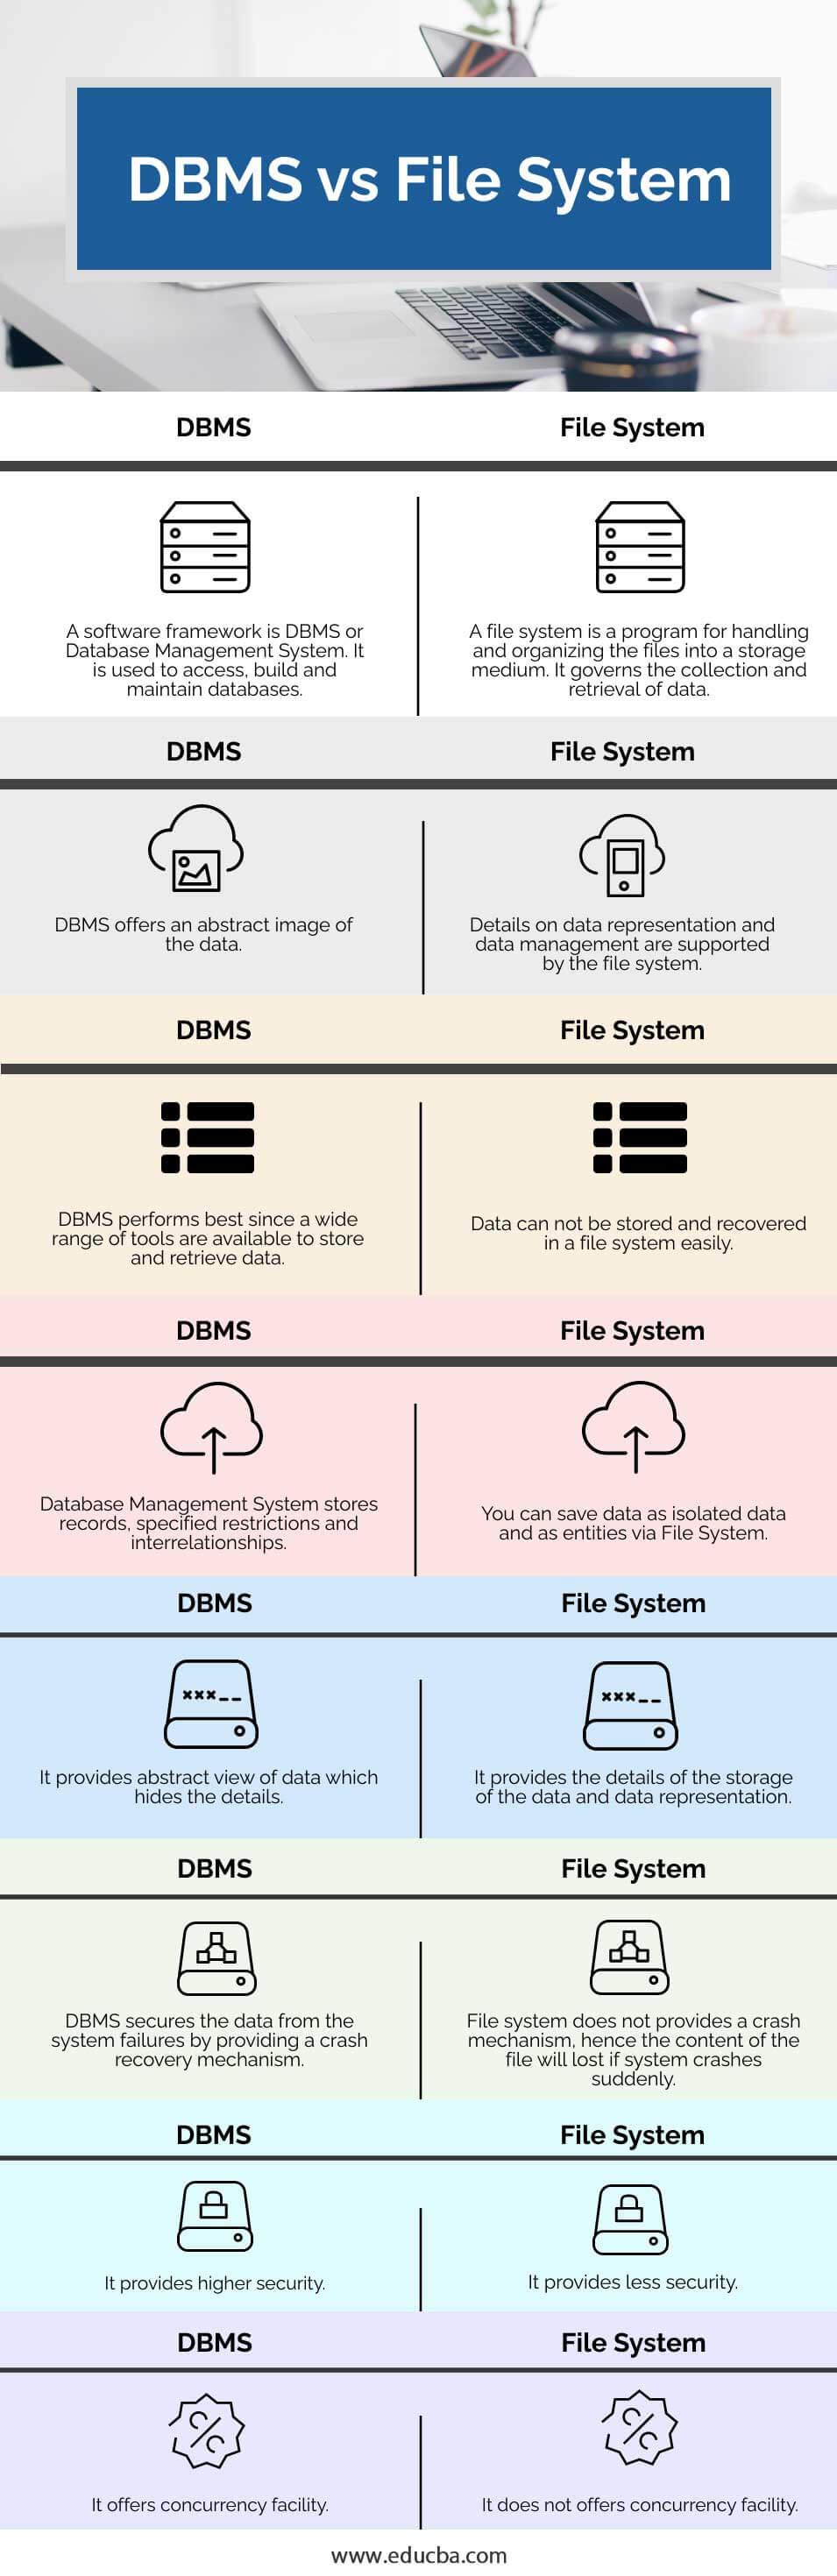 DBMS-vs-File-System-info